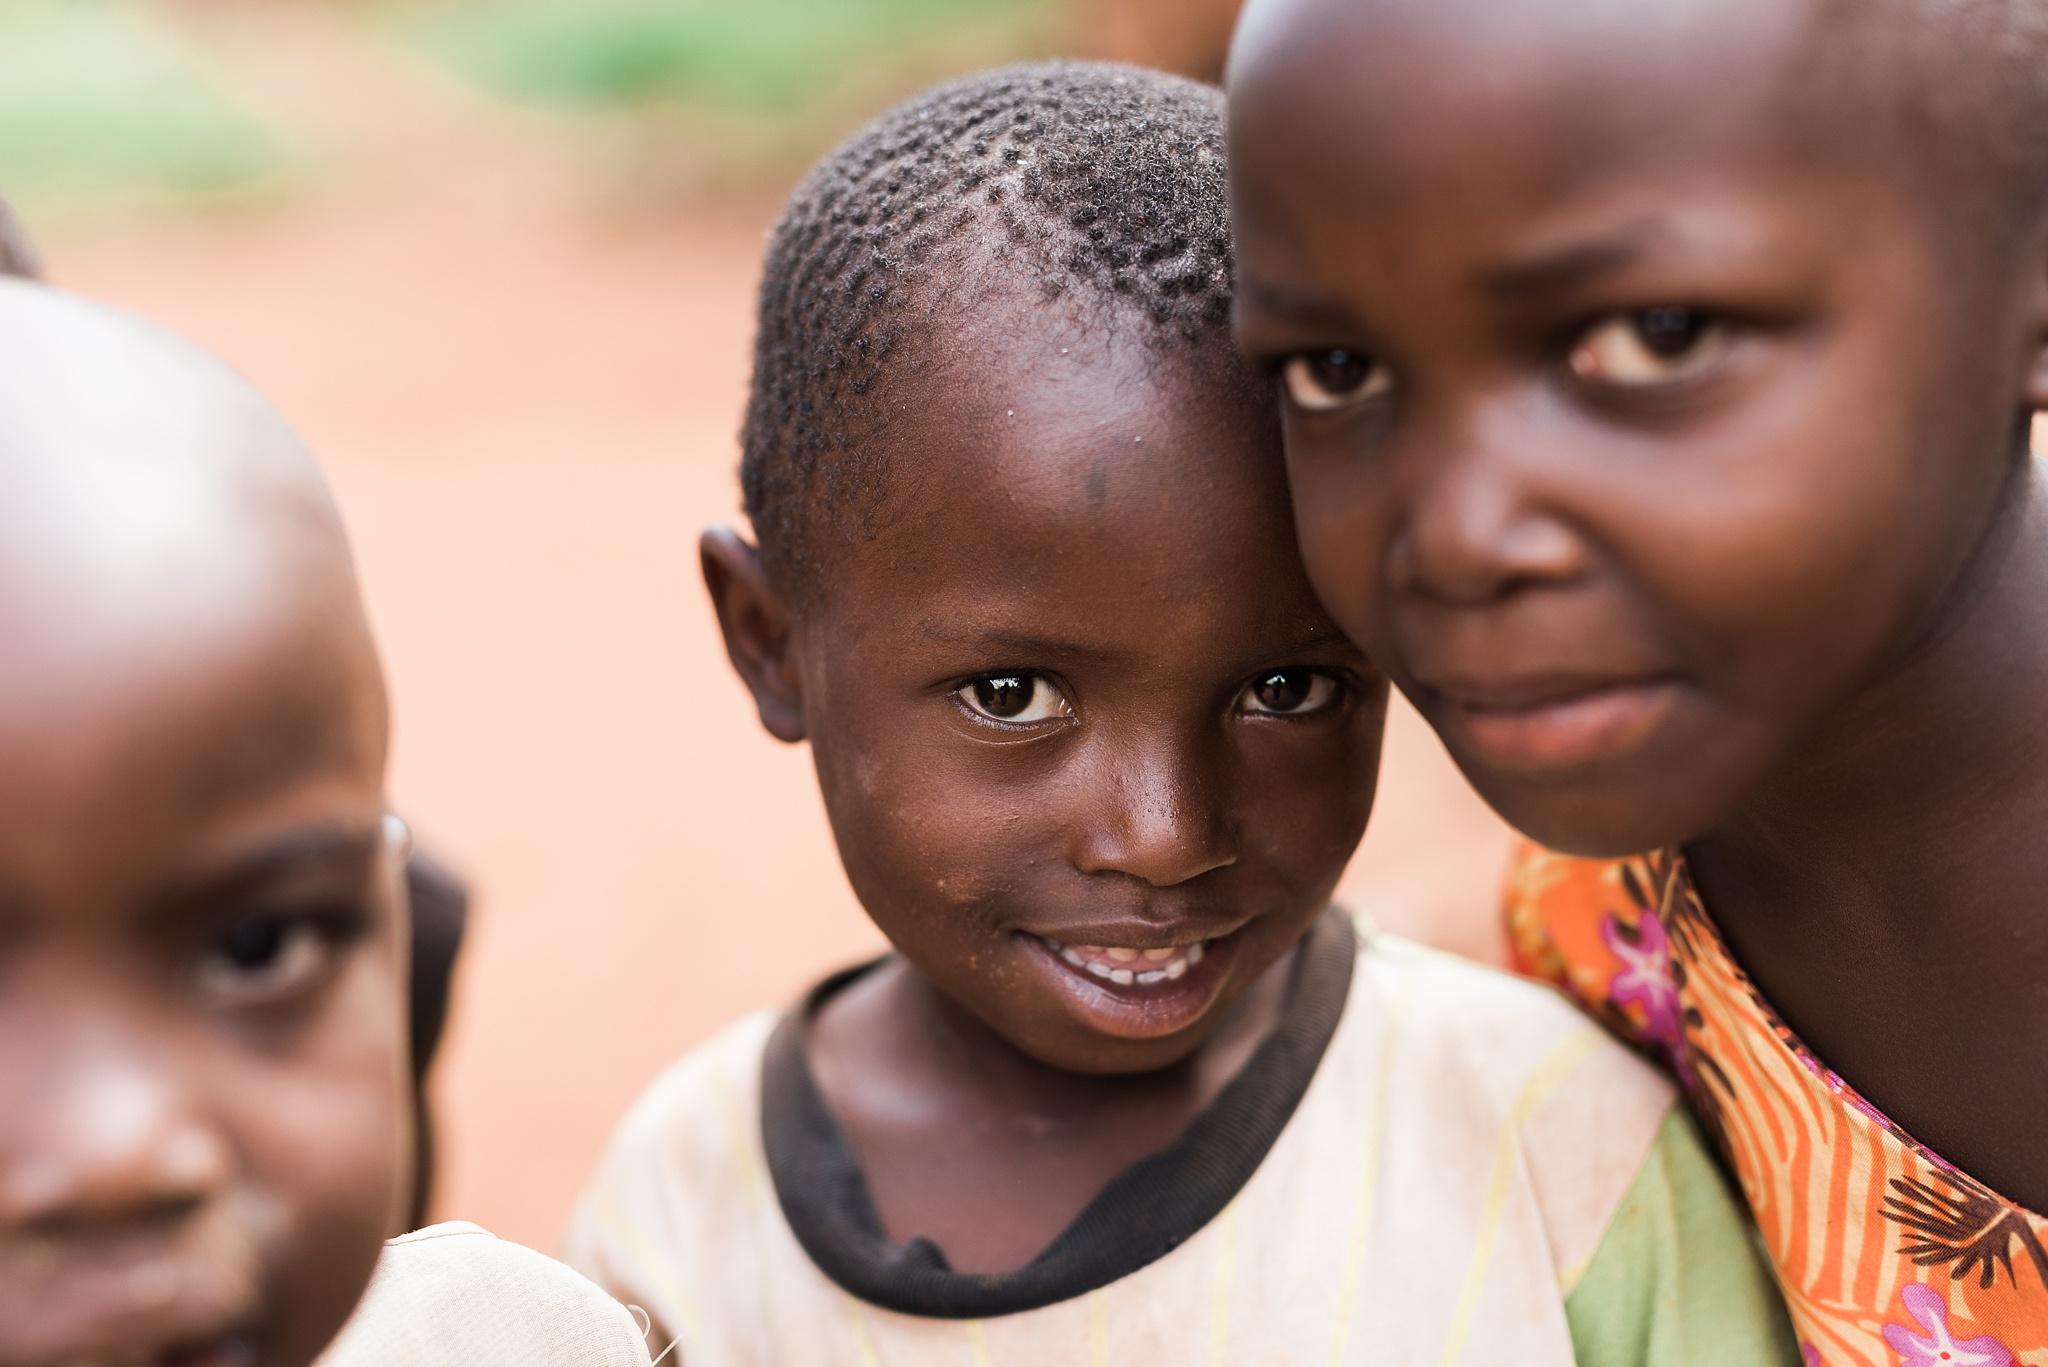 destination-photographer-uganda-graceforeducation-451.jpg